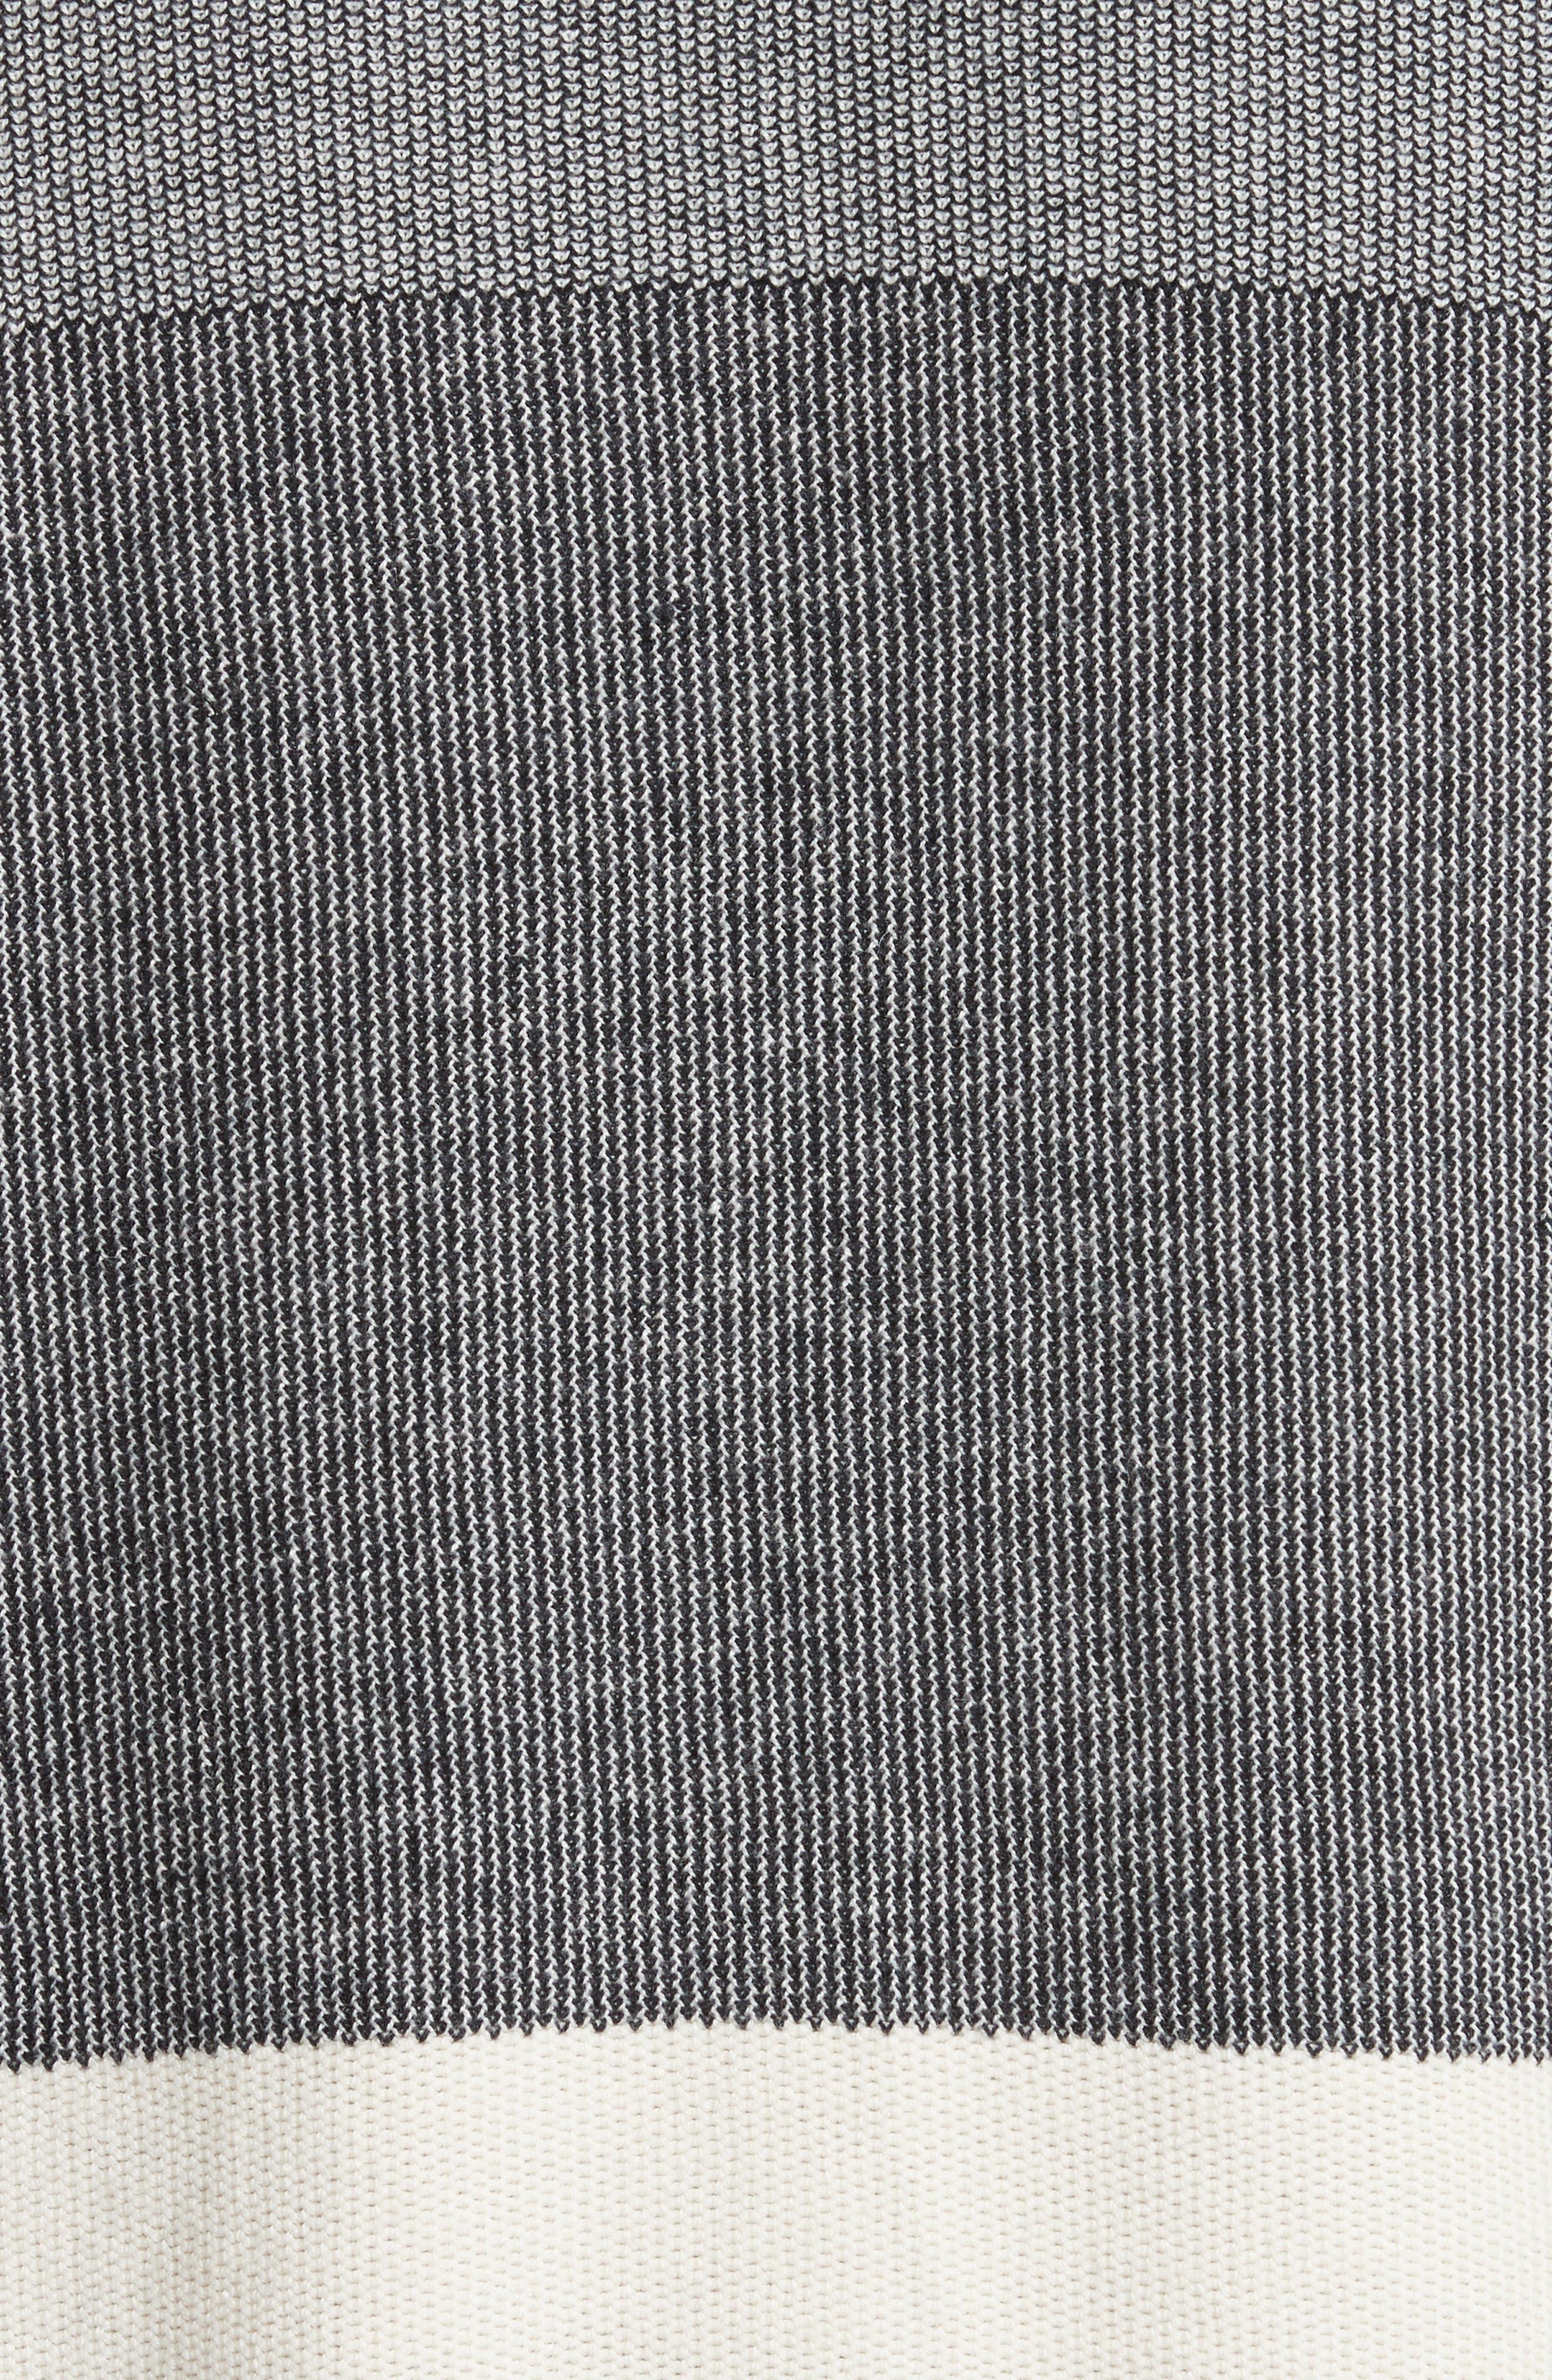 Colorblock Crewneck Sweater,                             Alternate thumbnail 5, color,                             001